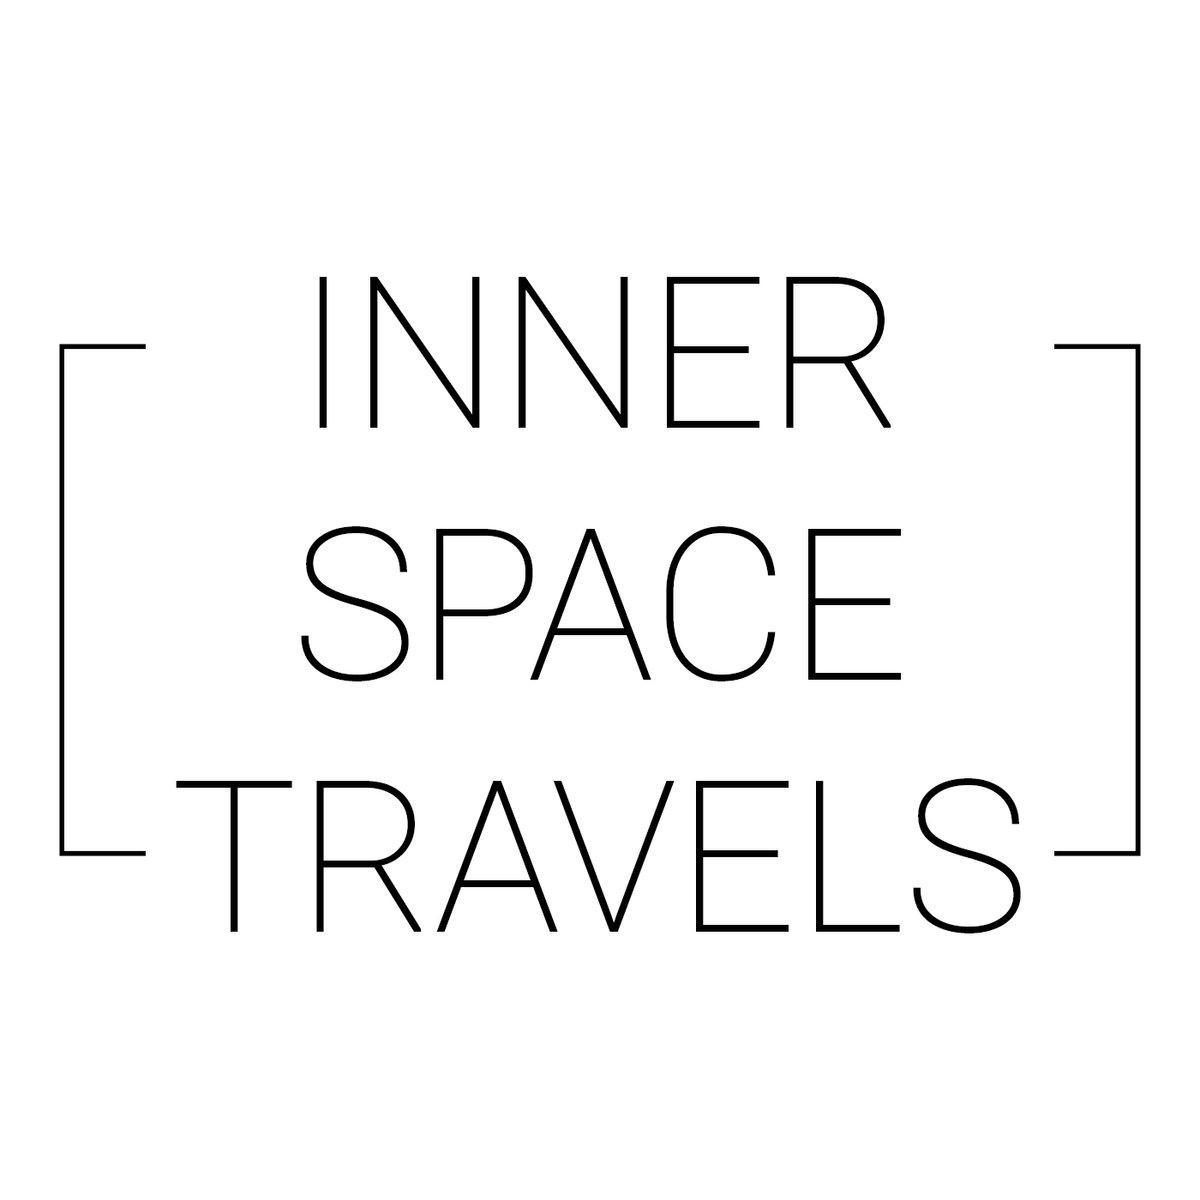 Inner Space Travels